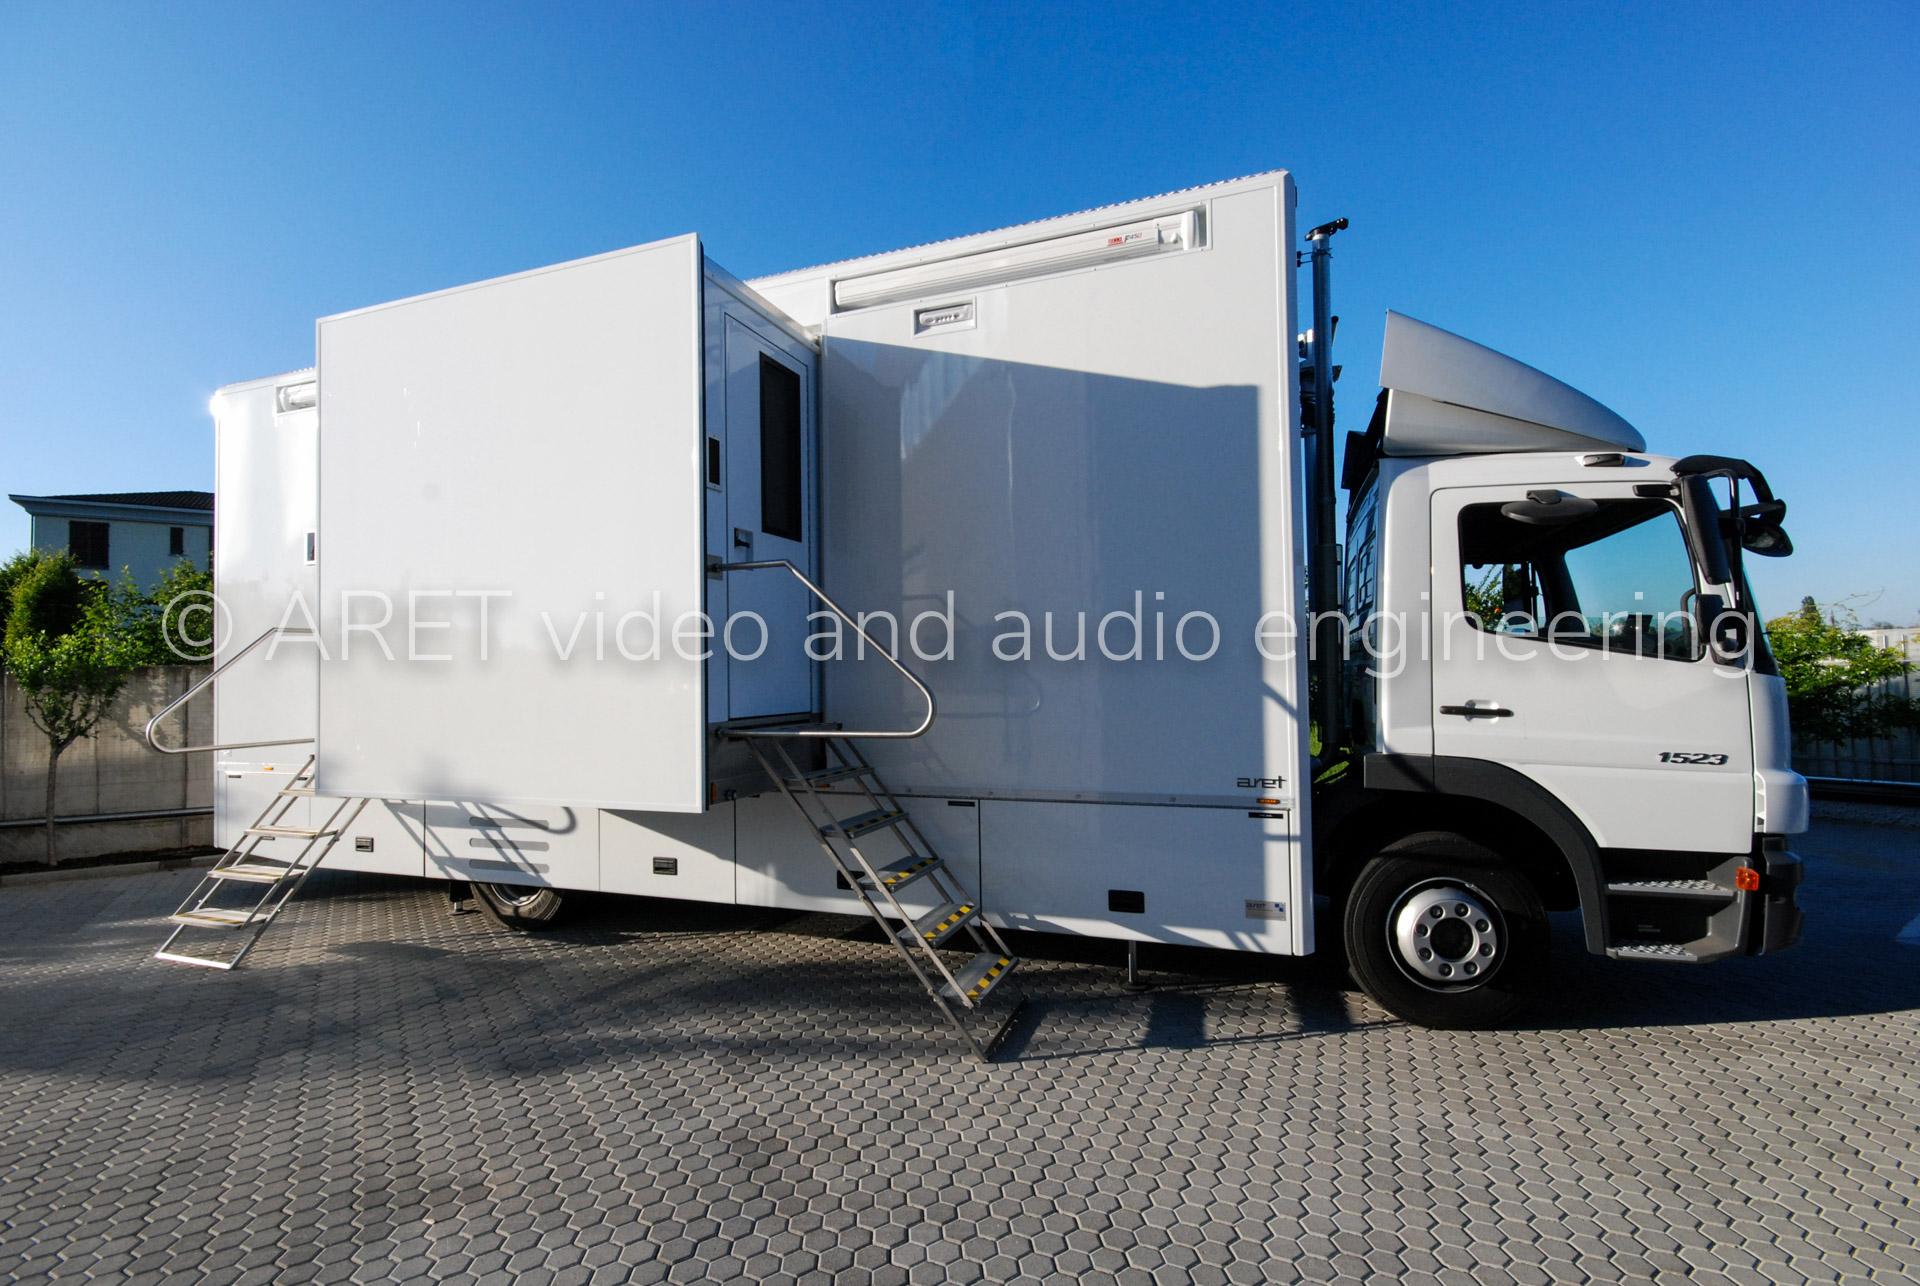 10 HD Cameras OB Van with side expansion - ARET